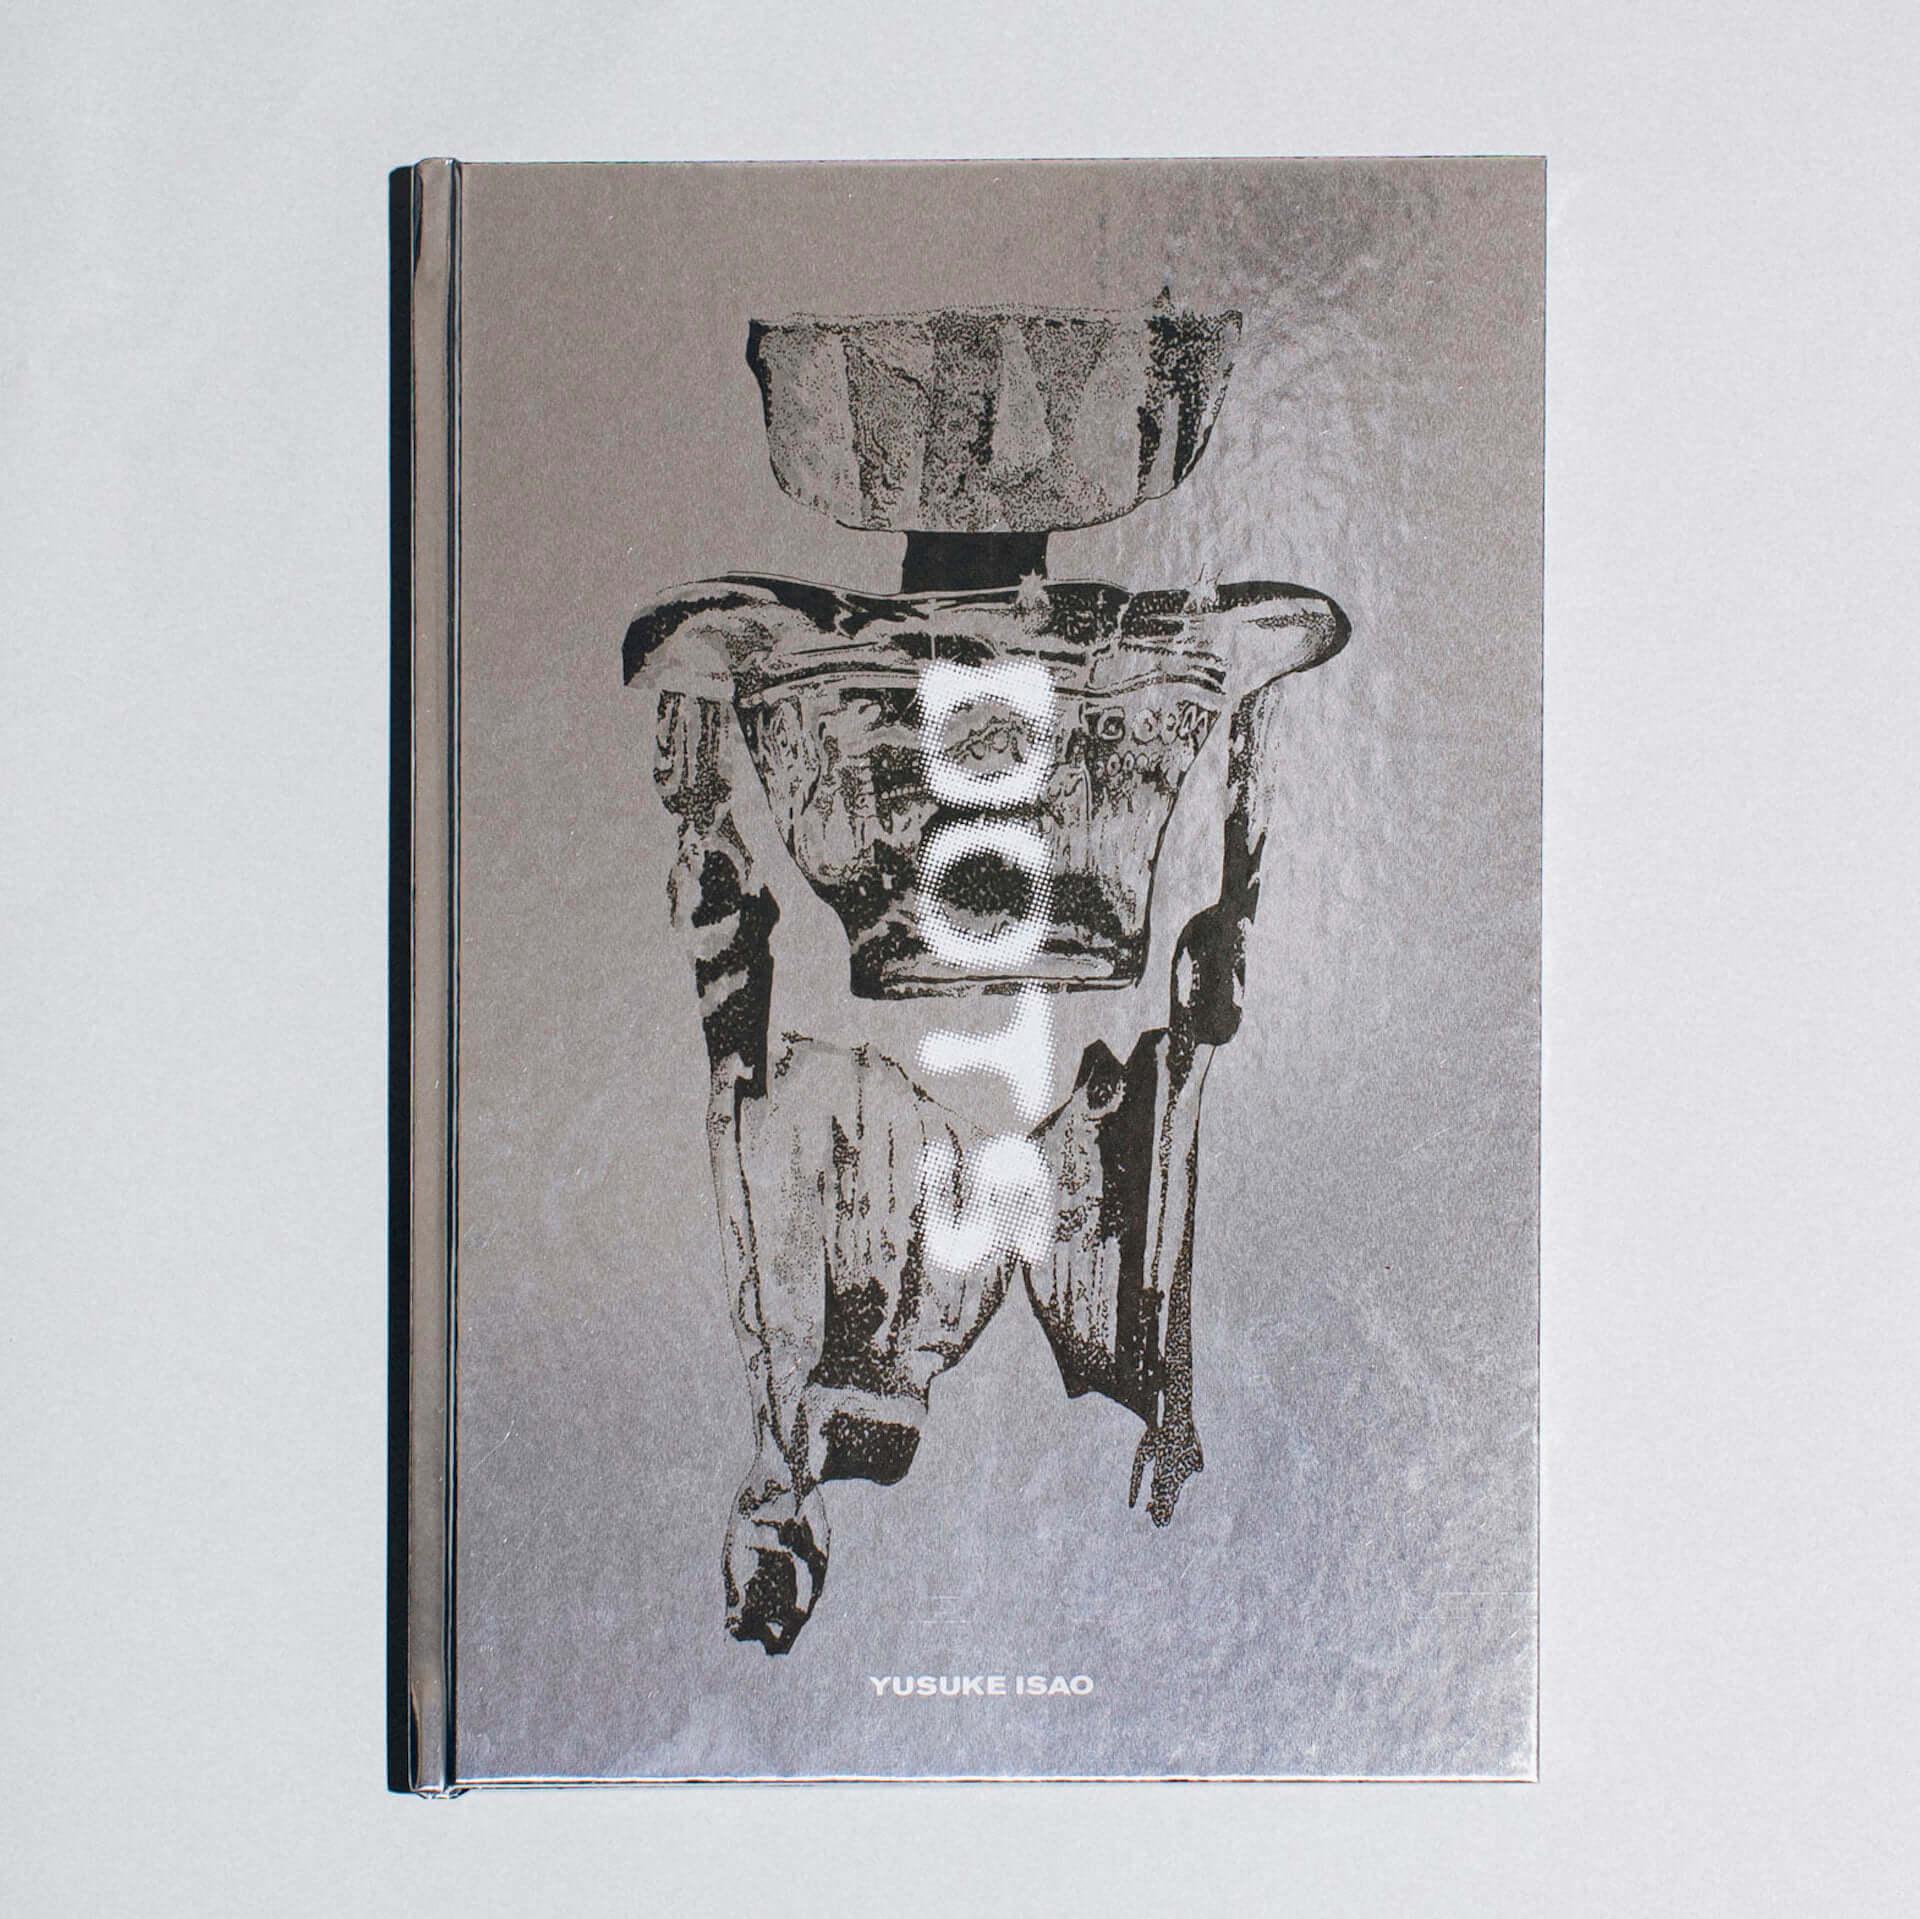 VJ・映像作家としても活躍する悳祐介の個展<DOTS>がLAID BUGにて開催決定!モノクロームの点描画作品を多数展示 art210304_yusuke-isao_6-1920x1919